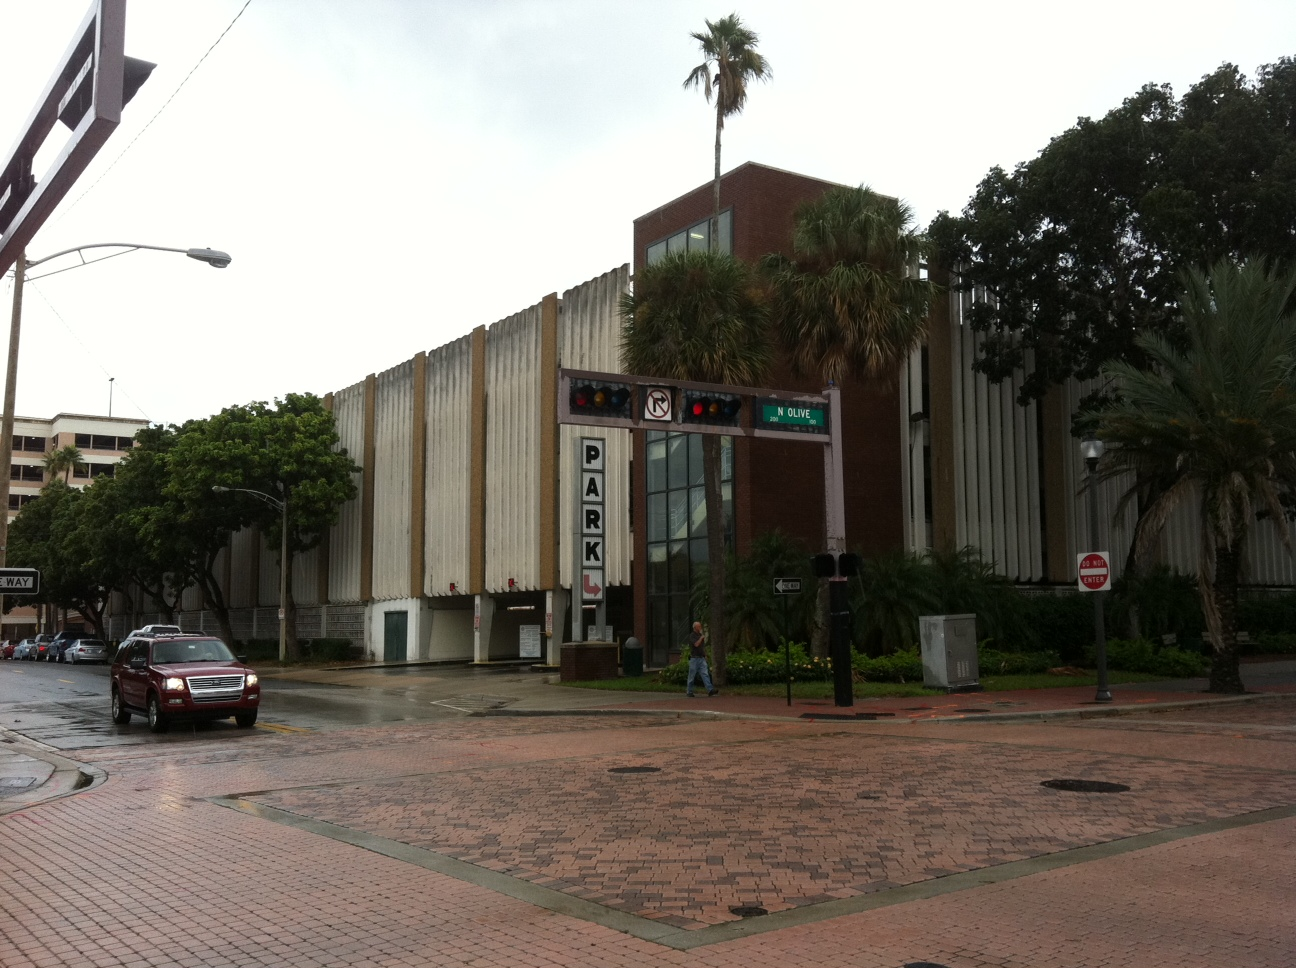 West Palm Beach, Florida (FL) profile:.